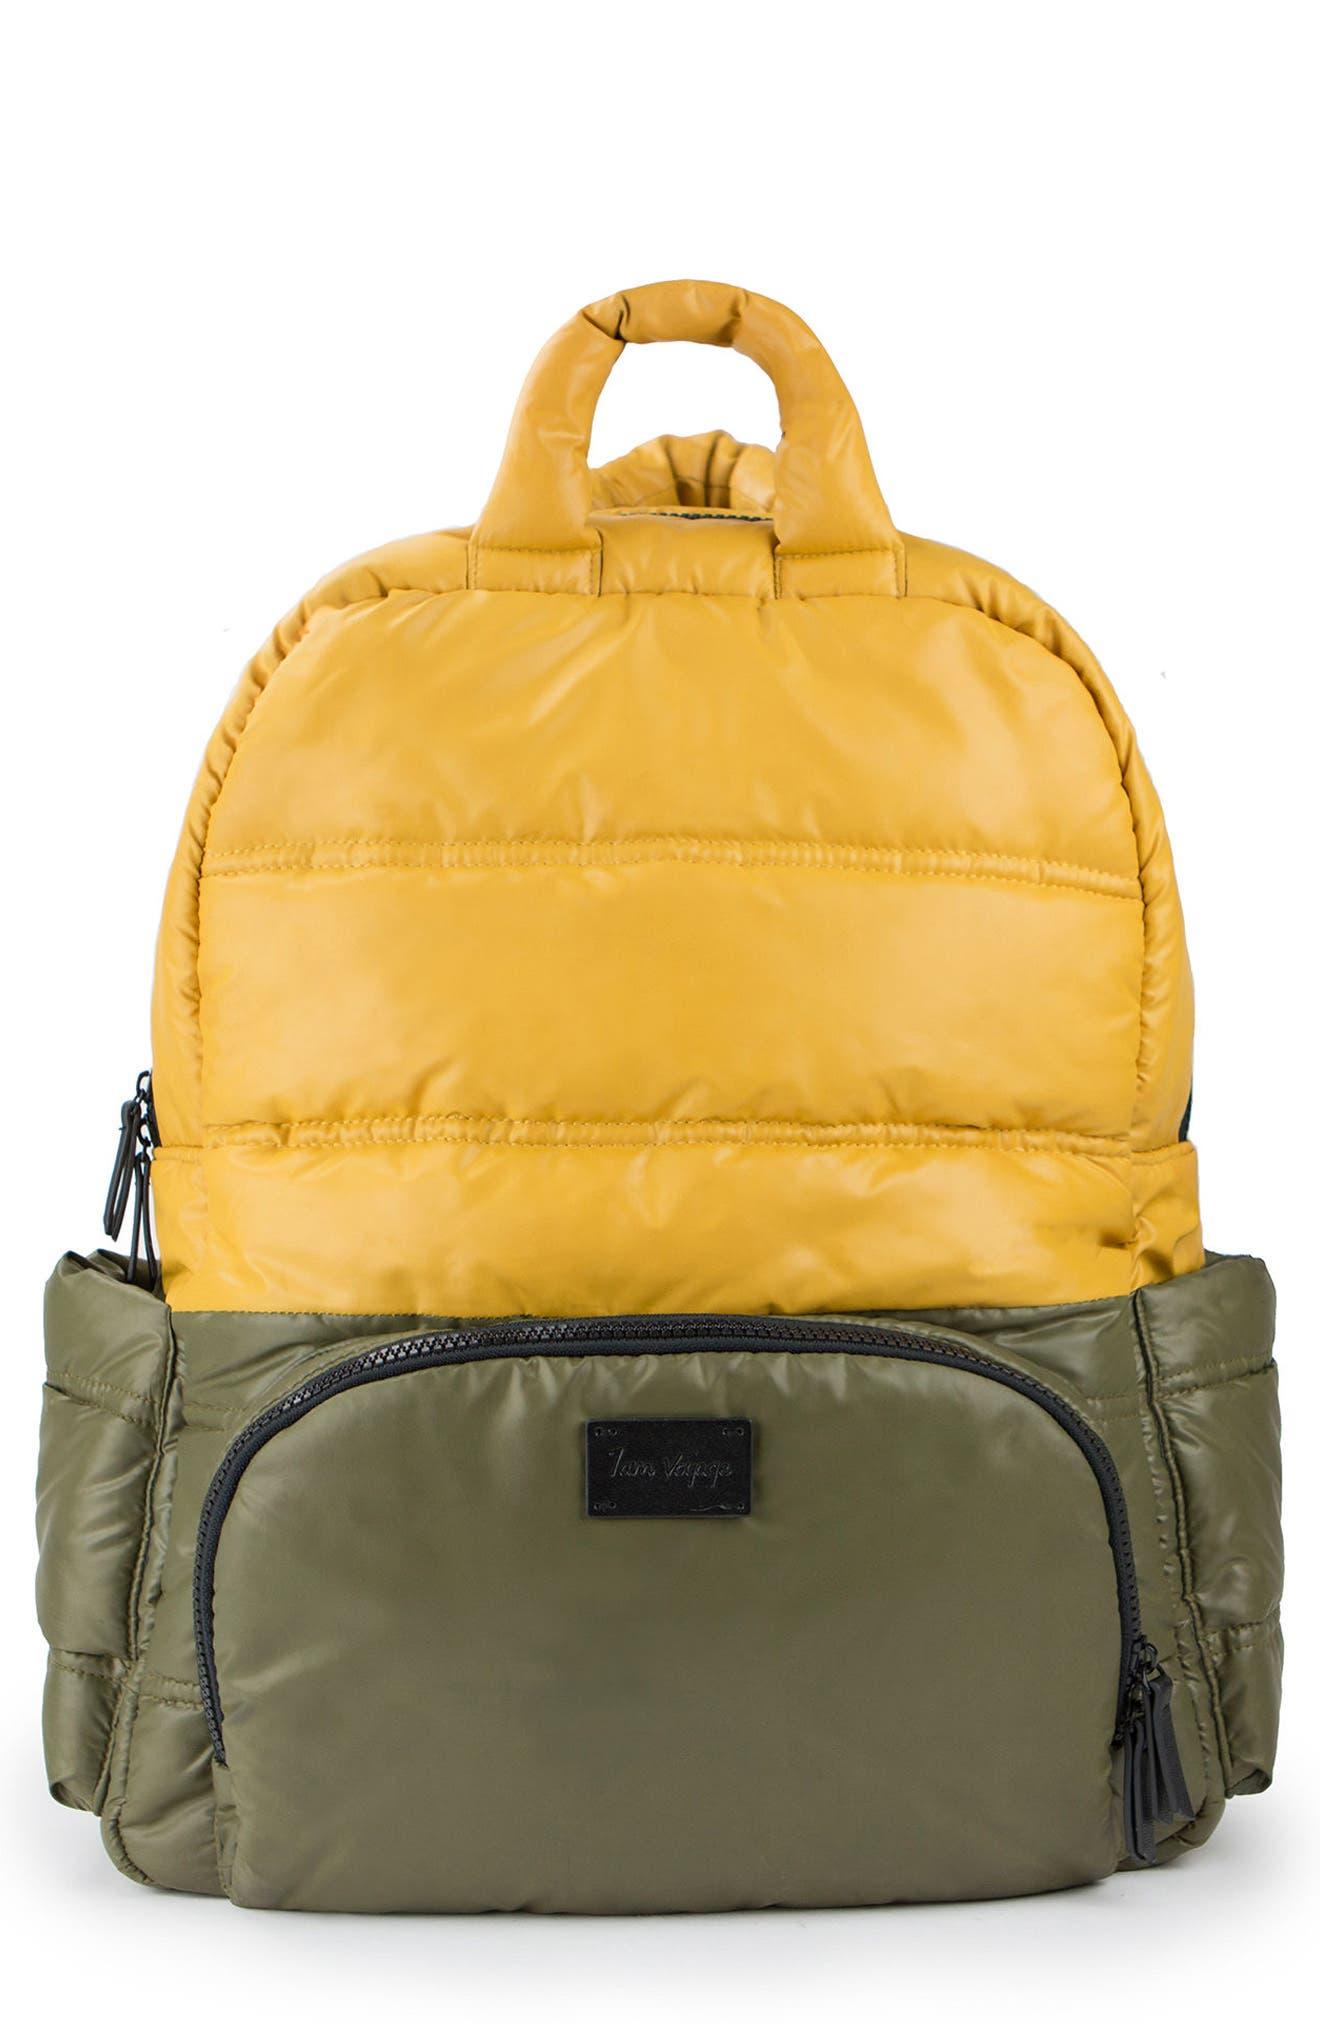 7 A.M. Enfant BK718 Water Repellent Diaper Backpack